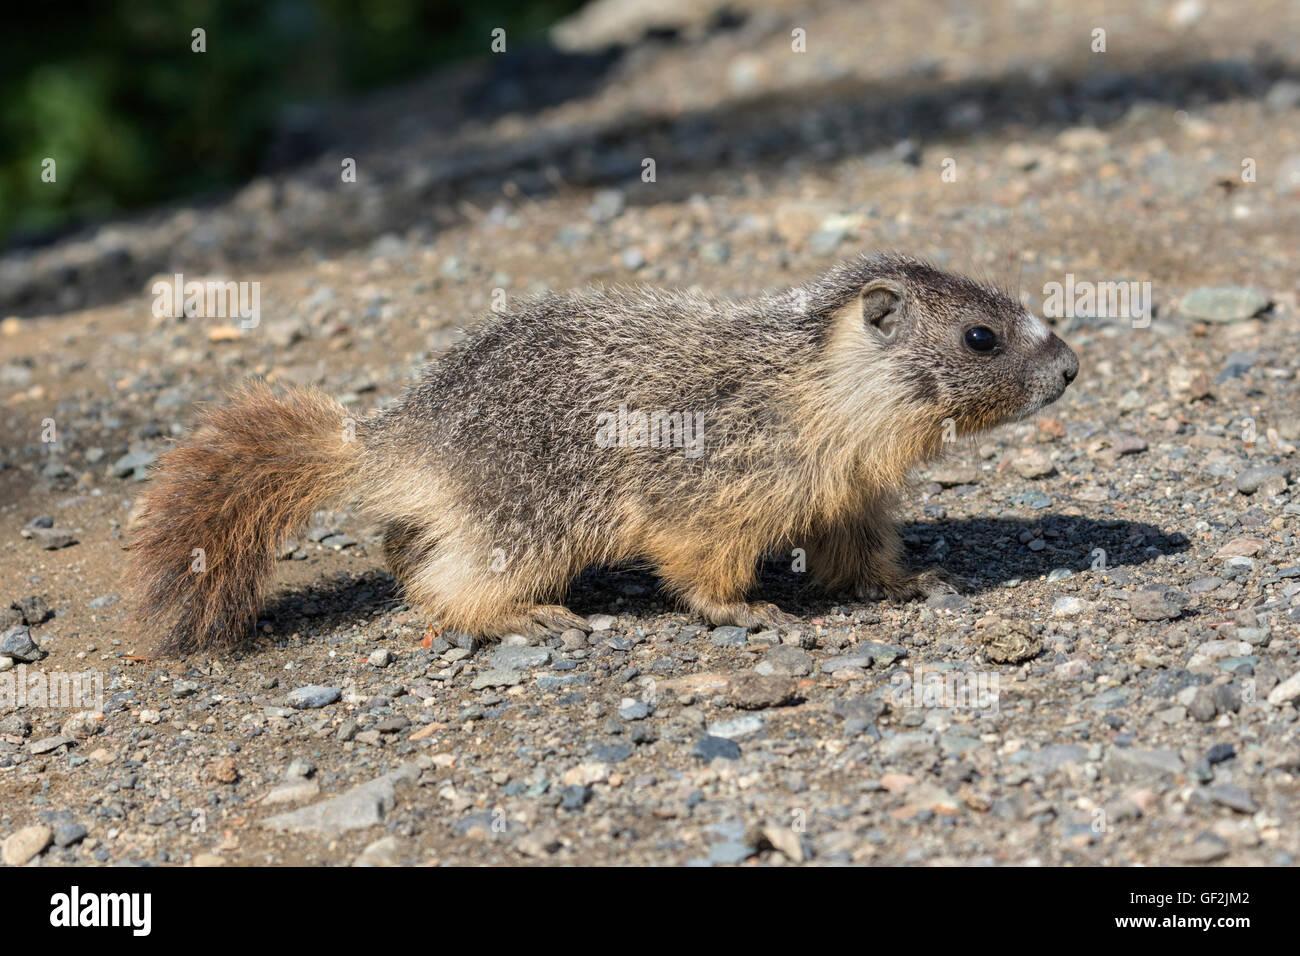 Yellow bellied Marmot - Stock Image